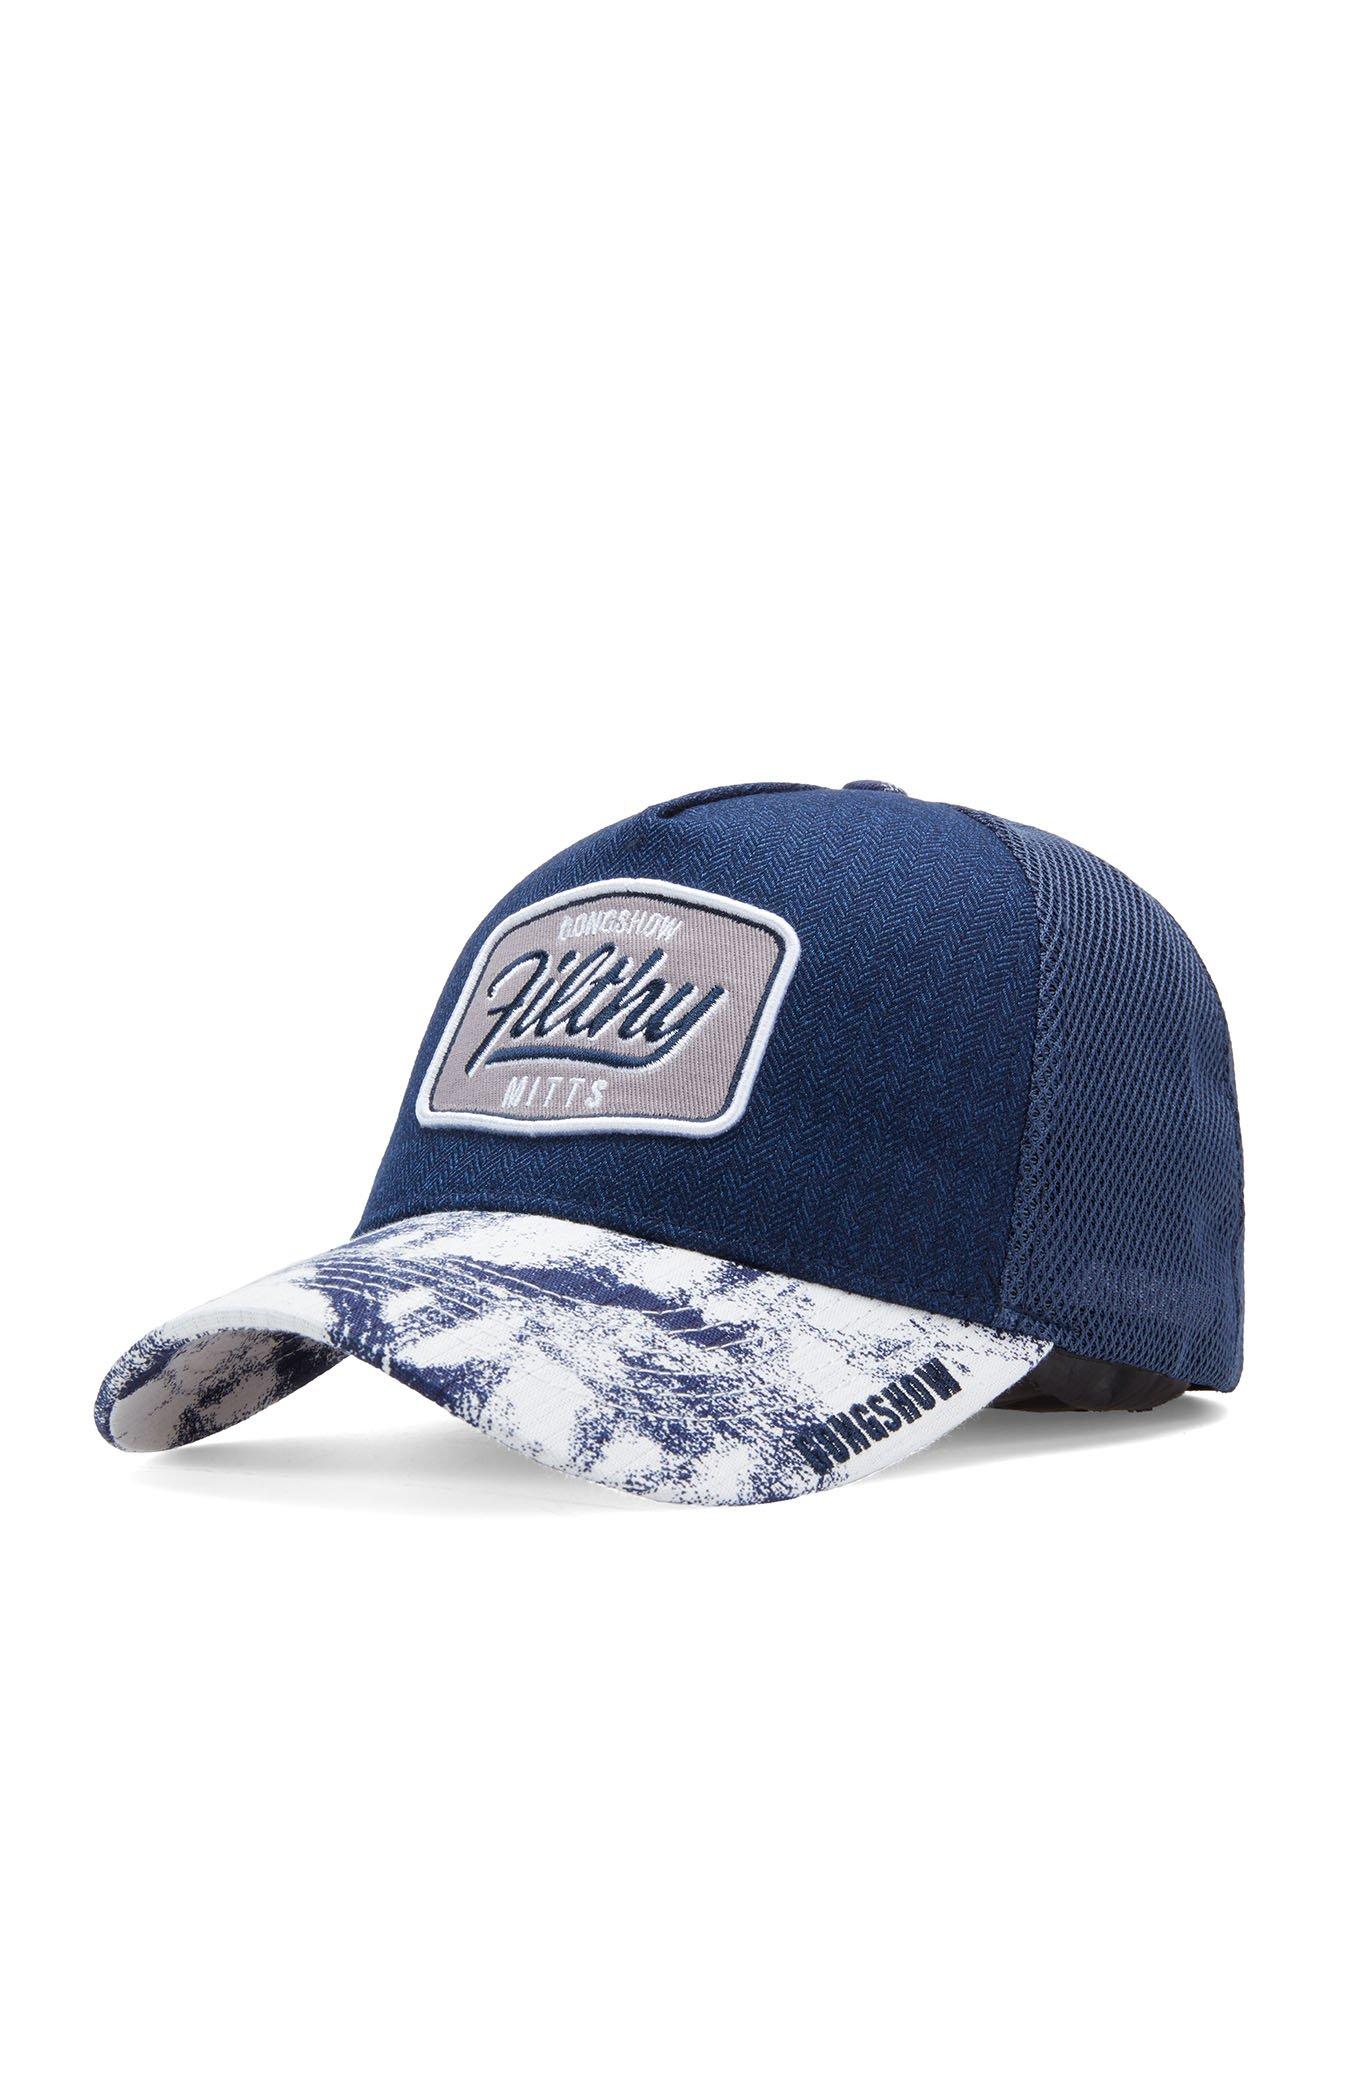 gs hat.jpg